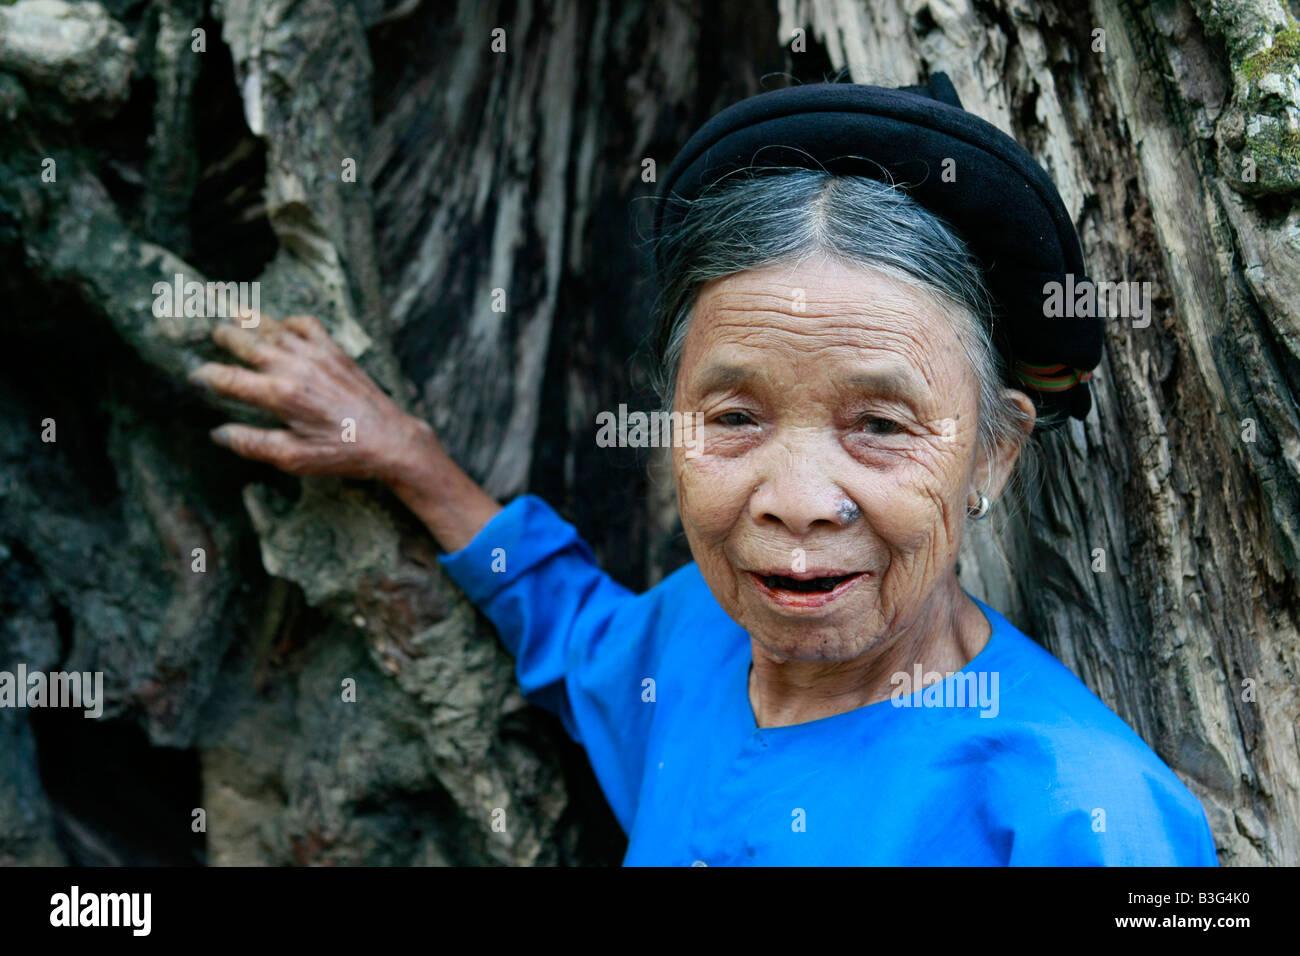 Nung tribeswoman near Hoang Su Phi, Vietnam - Stock Image